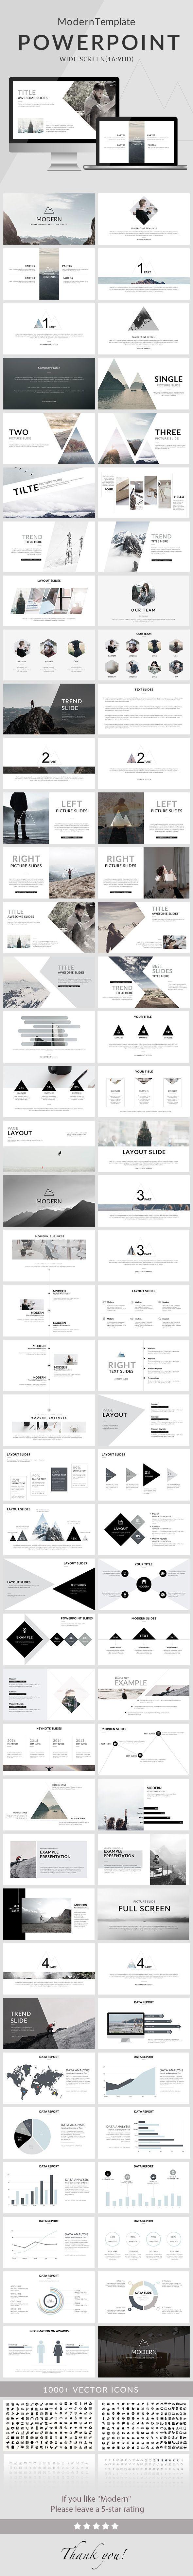 Modern - Powerpoint Template. Download here: https://graphicriver.net/item/modern-powerpoint-template/17237032?ref=ksioks